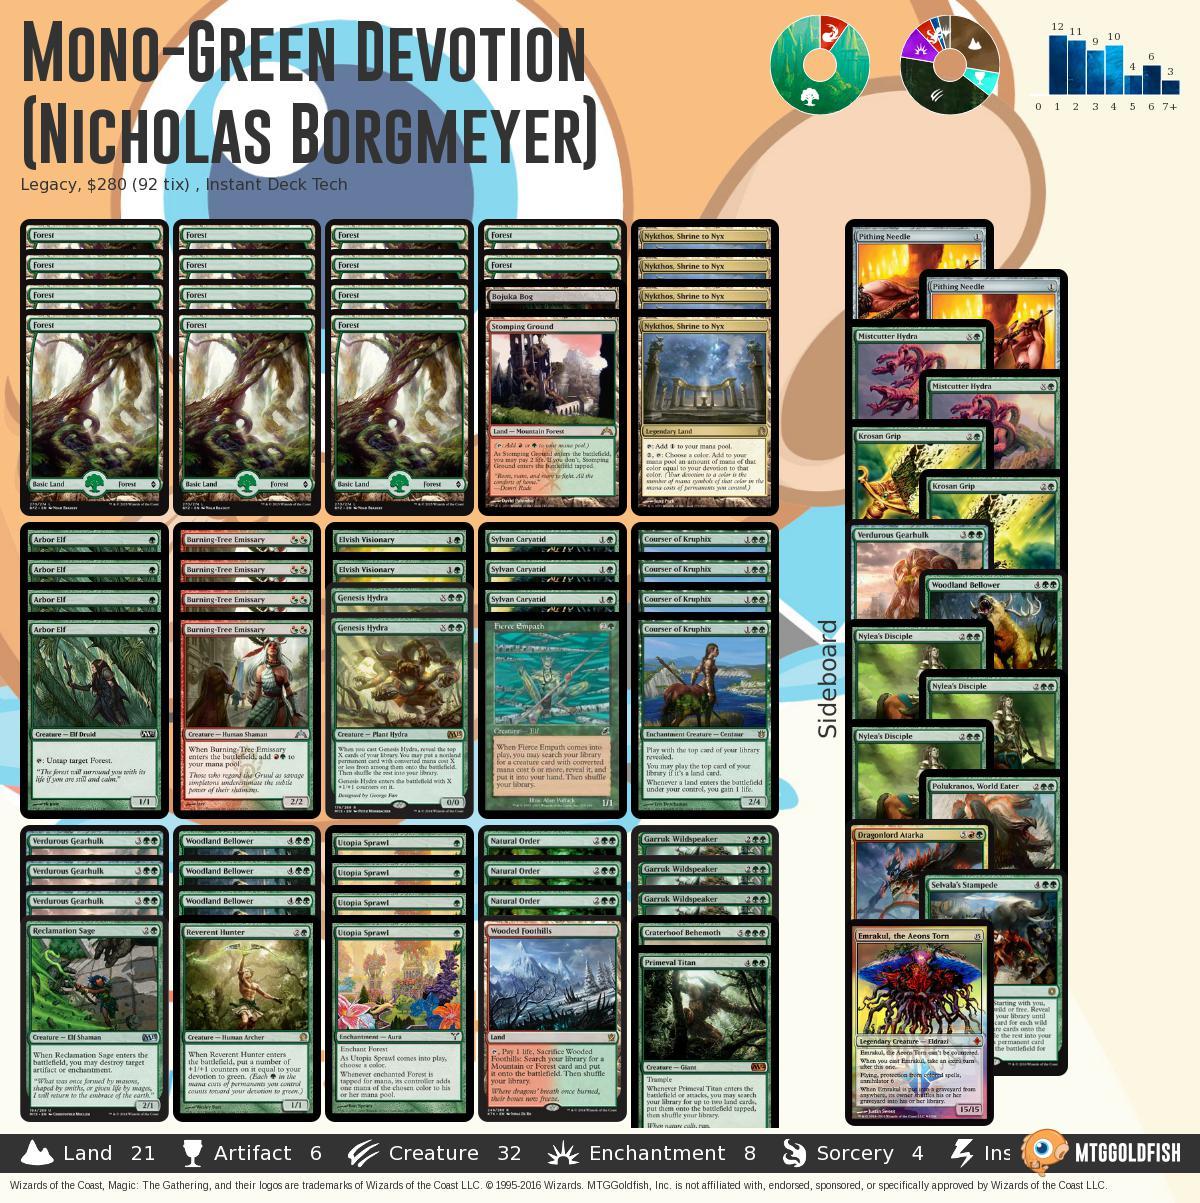 Mono green%2bdevotion%2b%2528nicholas%2bborgmeyer%2529 50be44d4 d608 412a 95d9 7511c30a766f%2ejpg